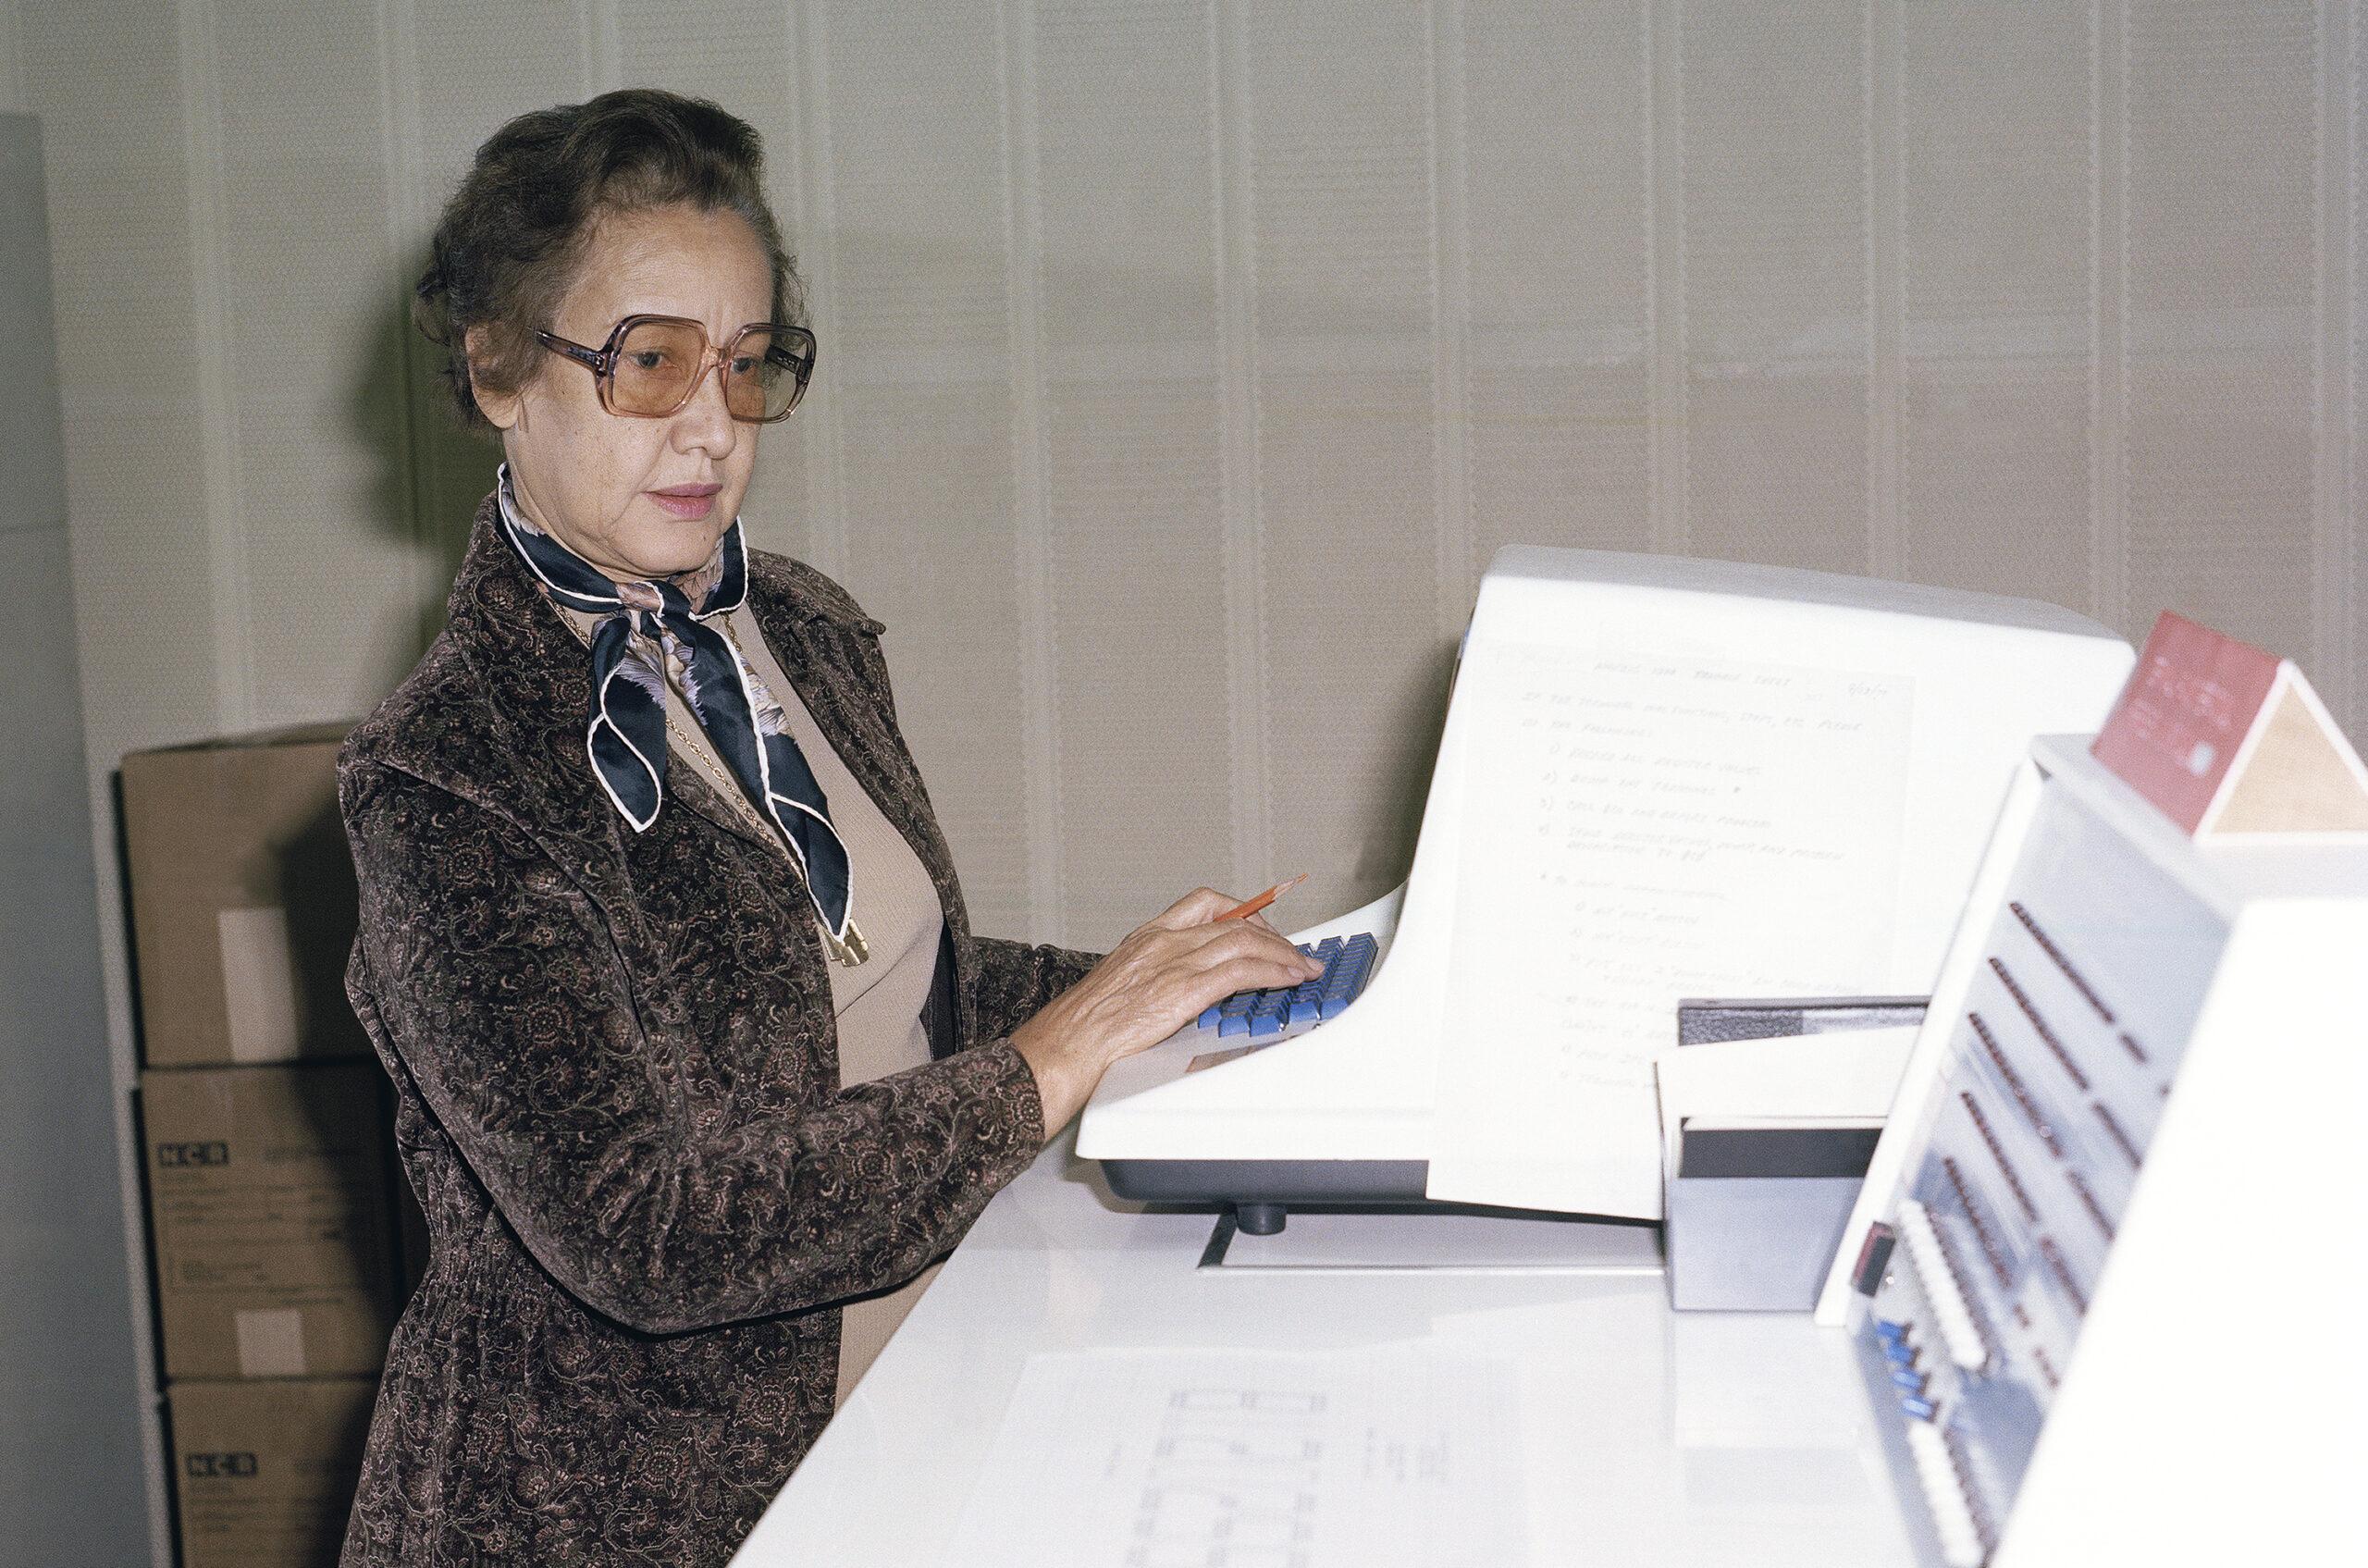 Katherine Johnson at NASA in 1980